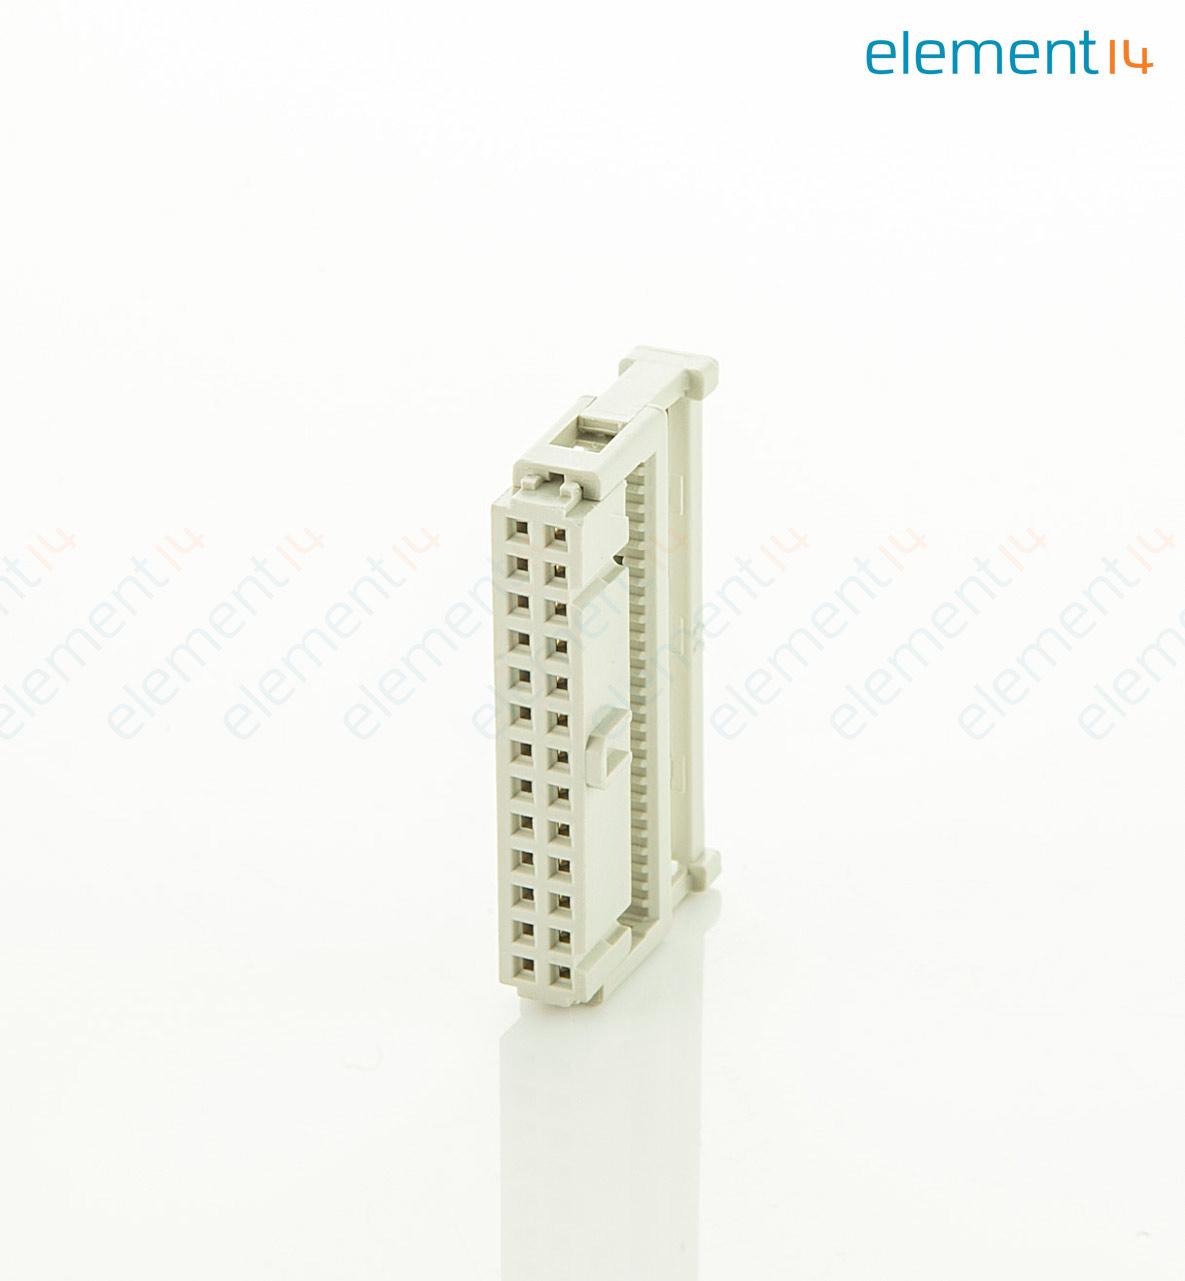 09 18 526 7813 harting connecteur fil carte mm 26 contact s. Black Bedroom Furniture Sets. Home Design Ideas